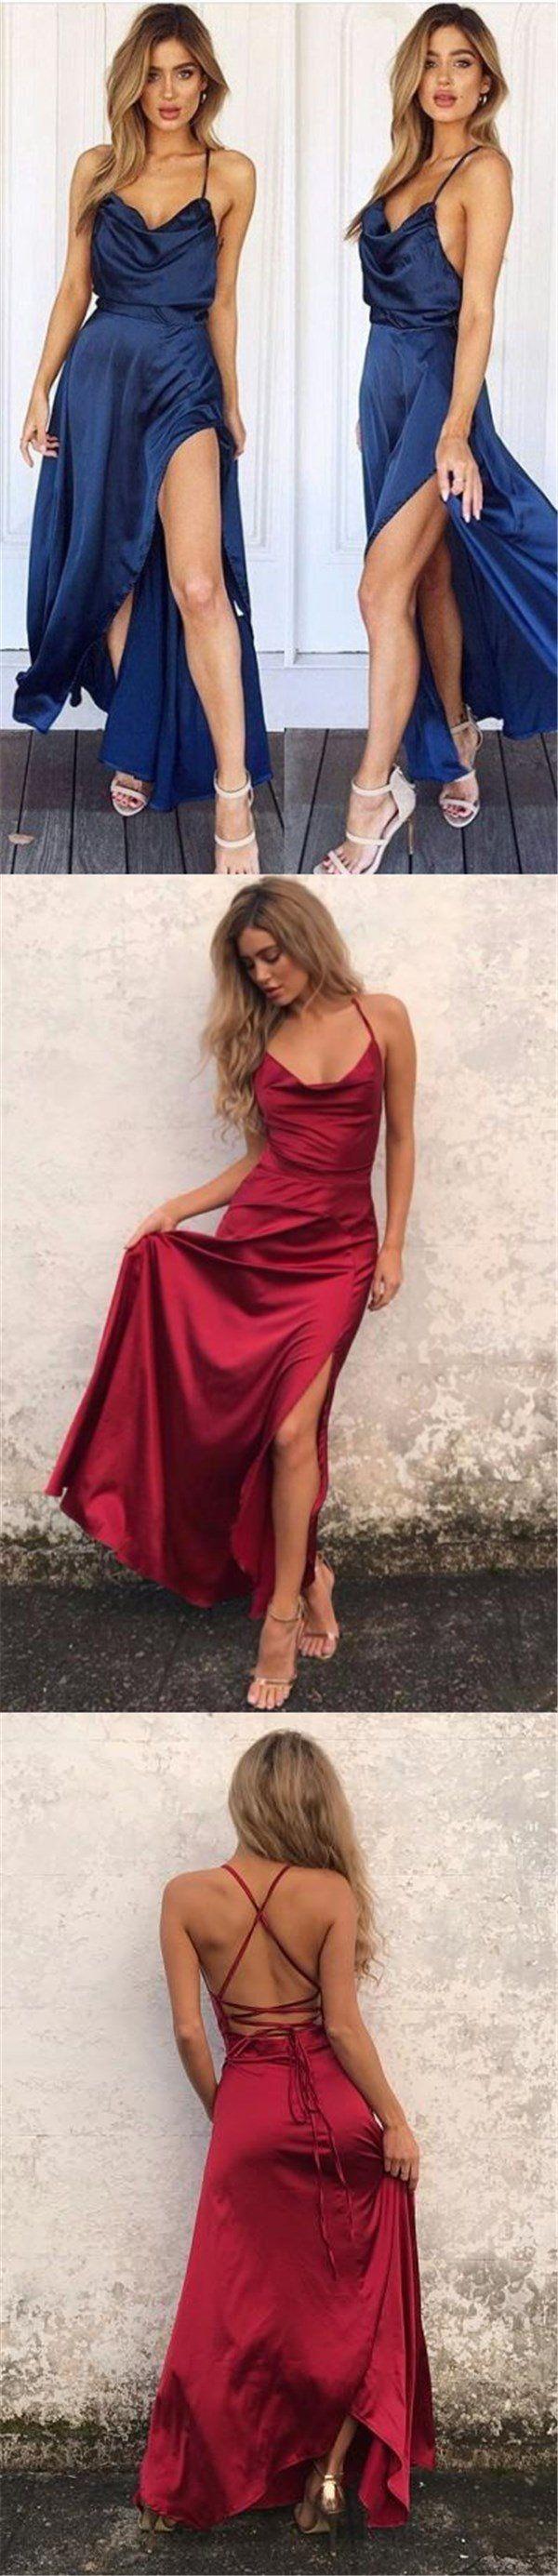 best dresses images on pinterest feminine fashion beautiful